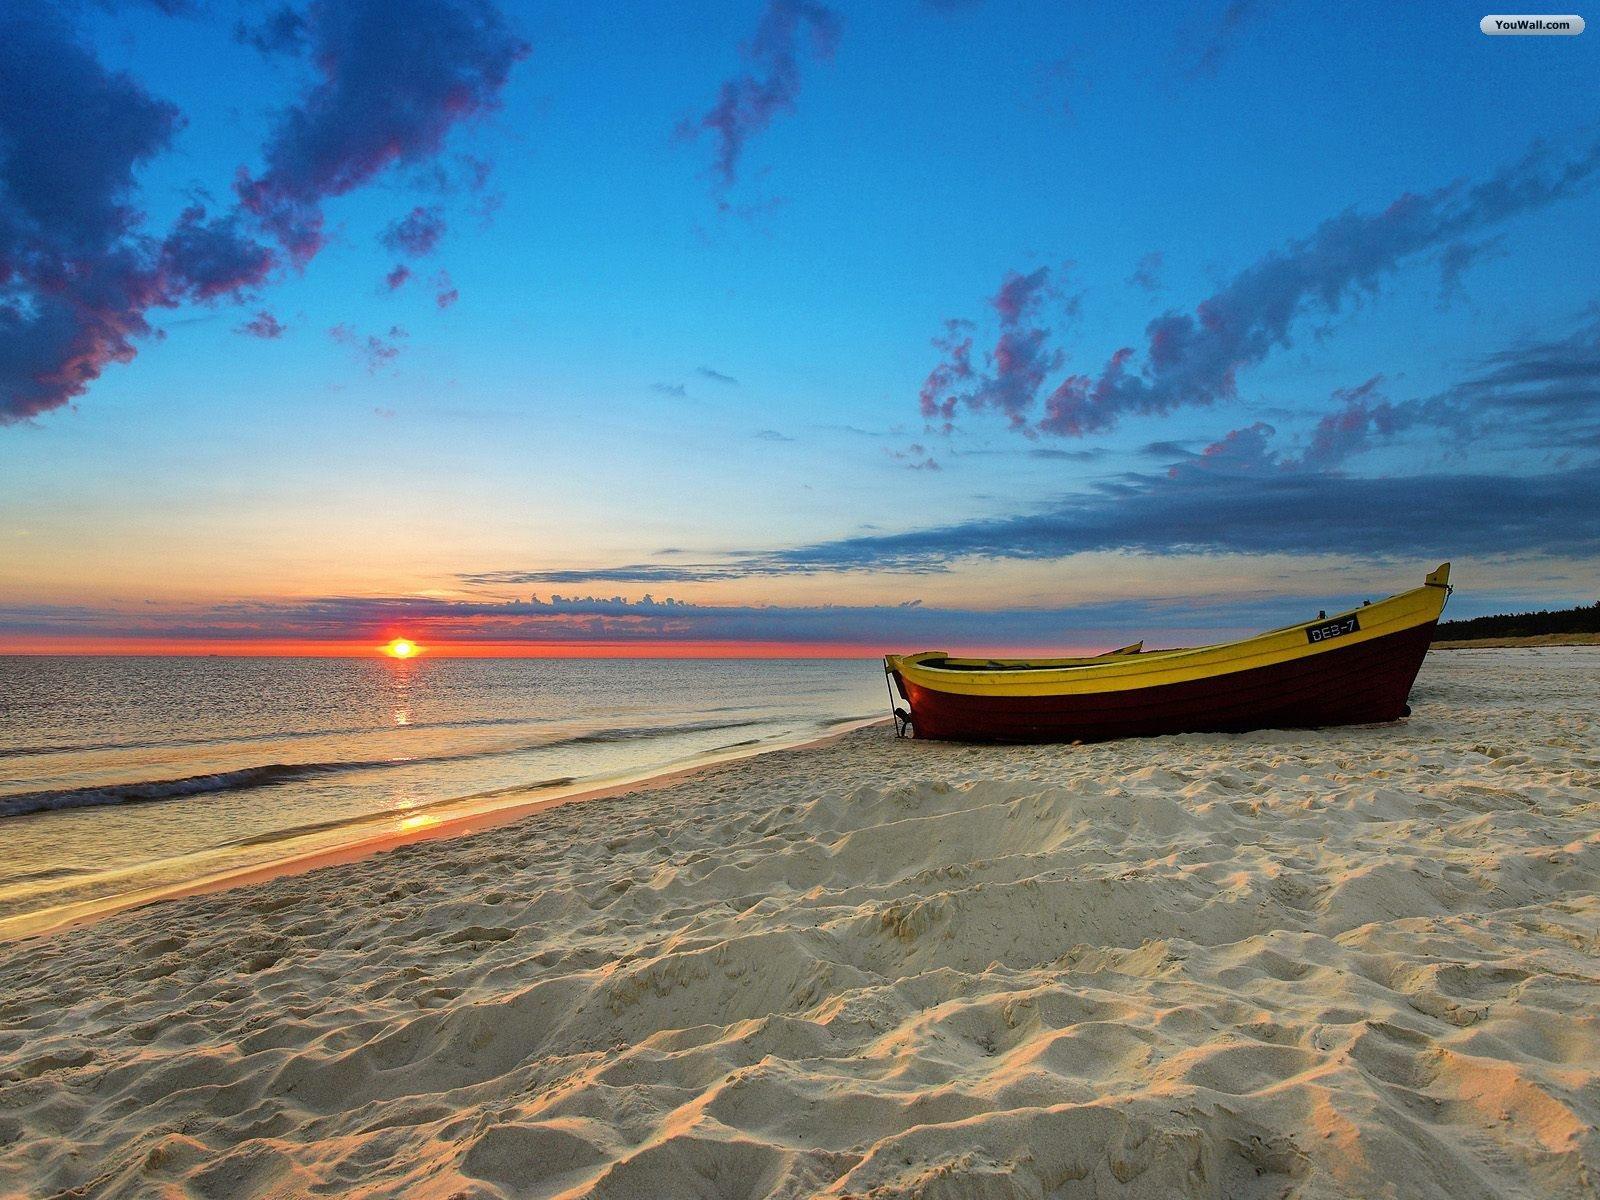 http://2.bp.blogspot.com/-1xb6vsdpndo/Tky7L0RbAeI/AAAAAAAAAEo/fUkB6OK0Nts/s1600/free+beach_sunset_wallpaper.jpg